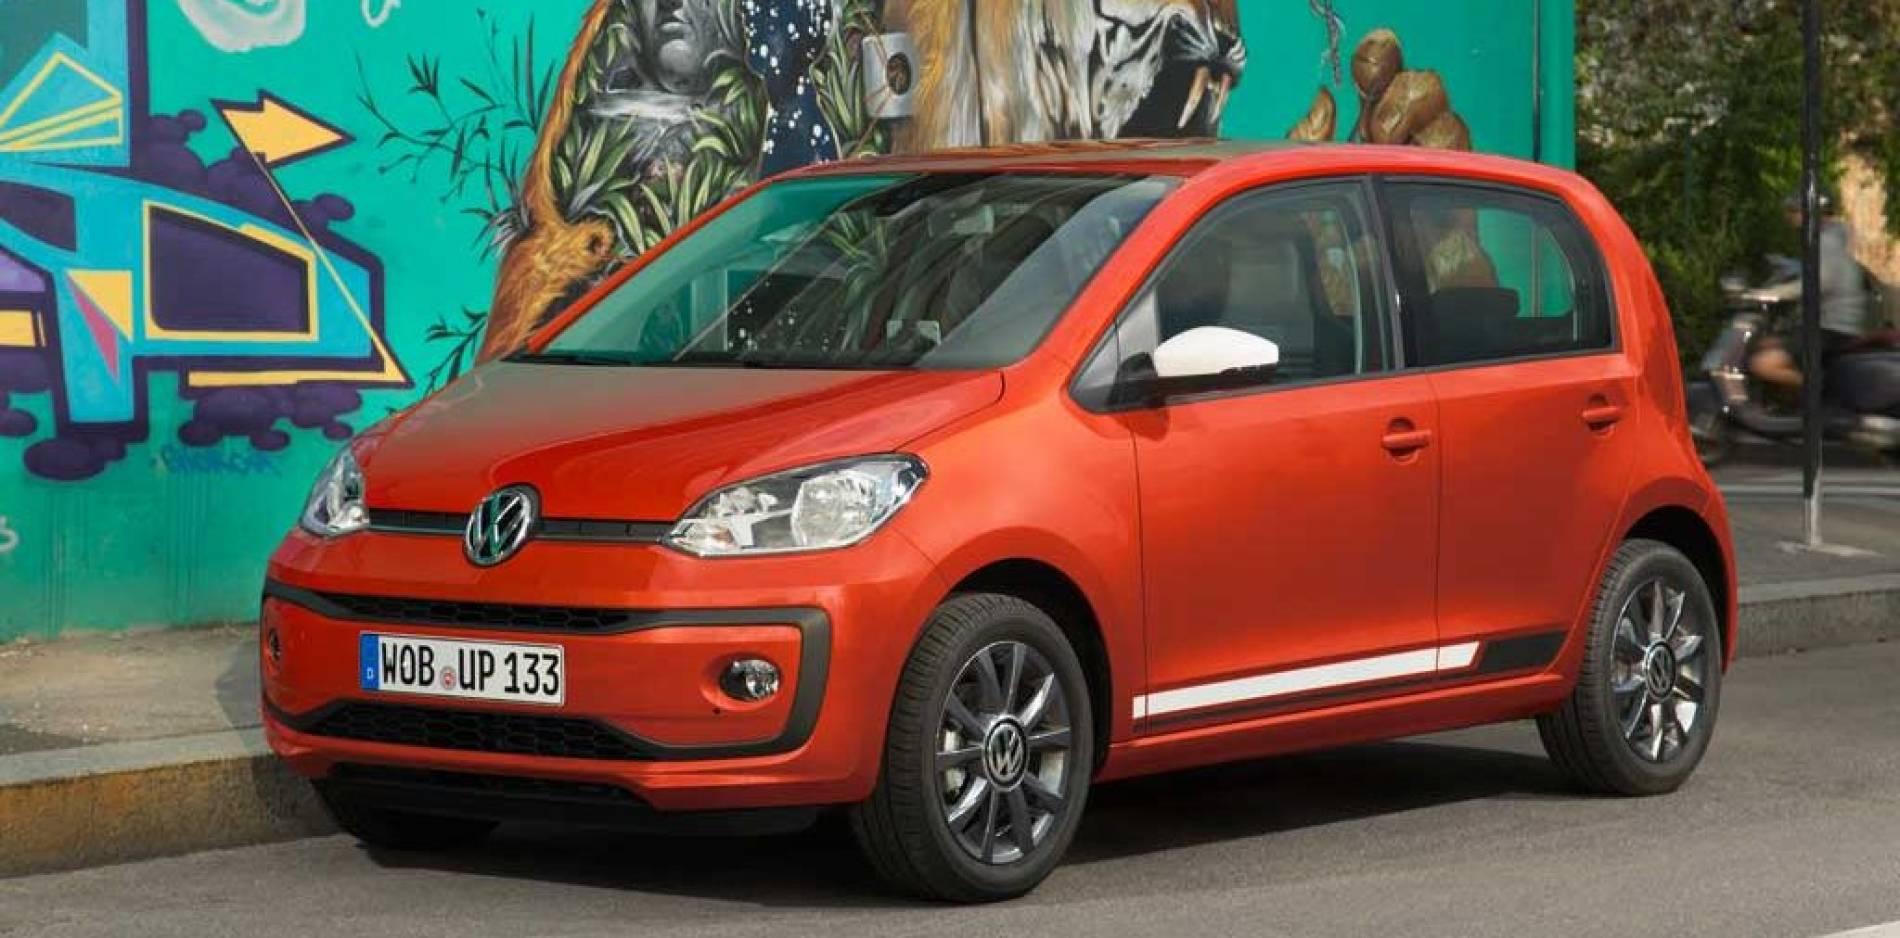 Prueba Volkswagen up! 2016: Sin límites